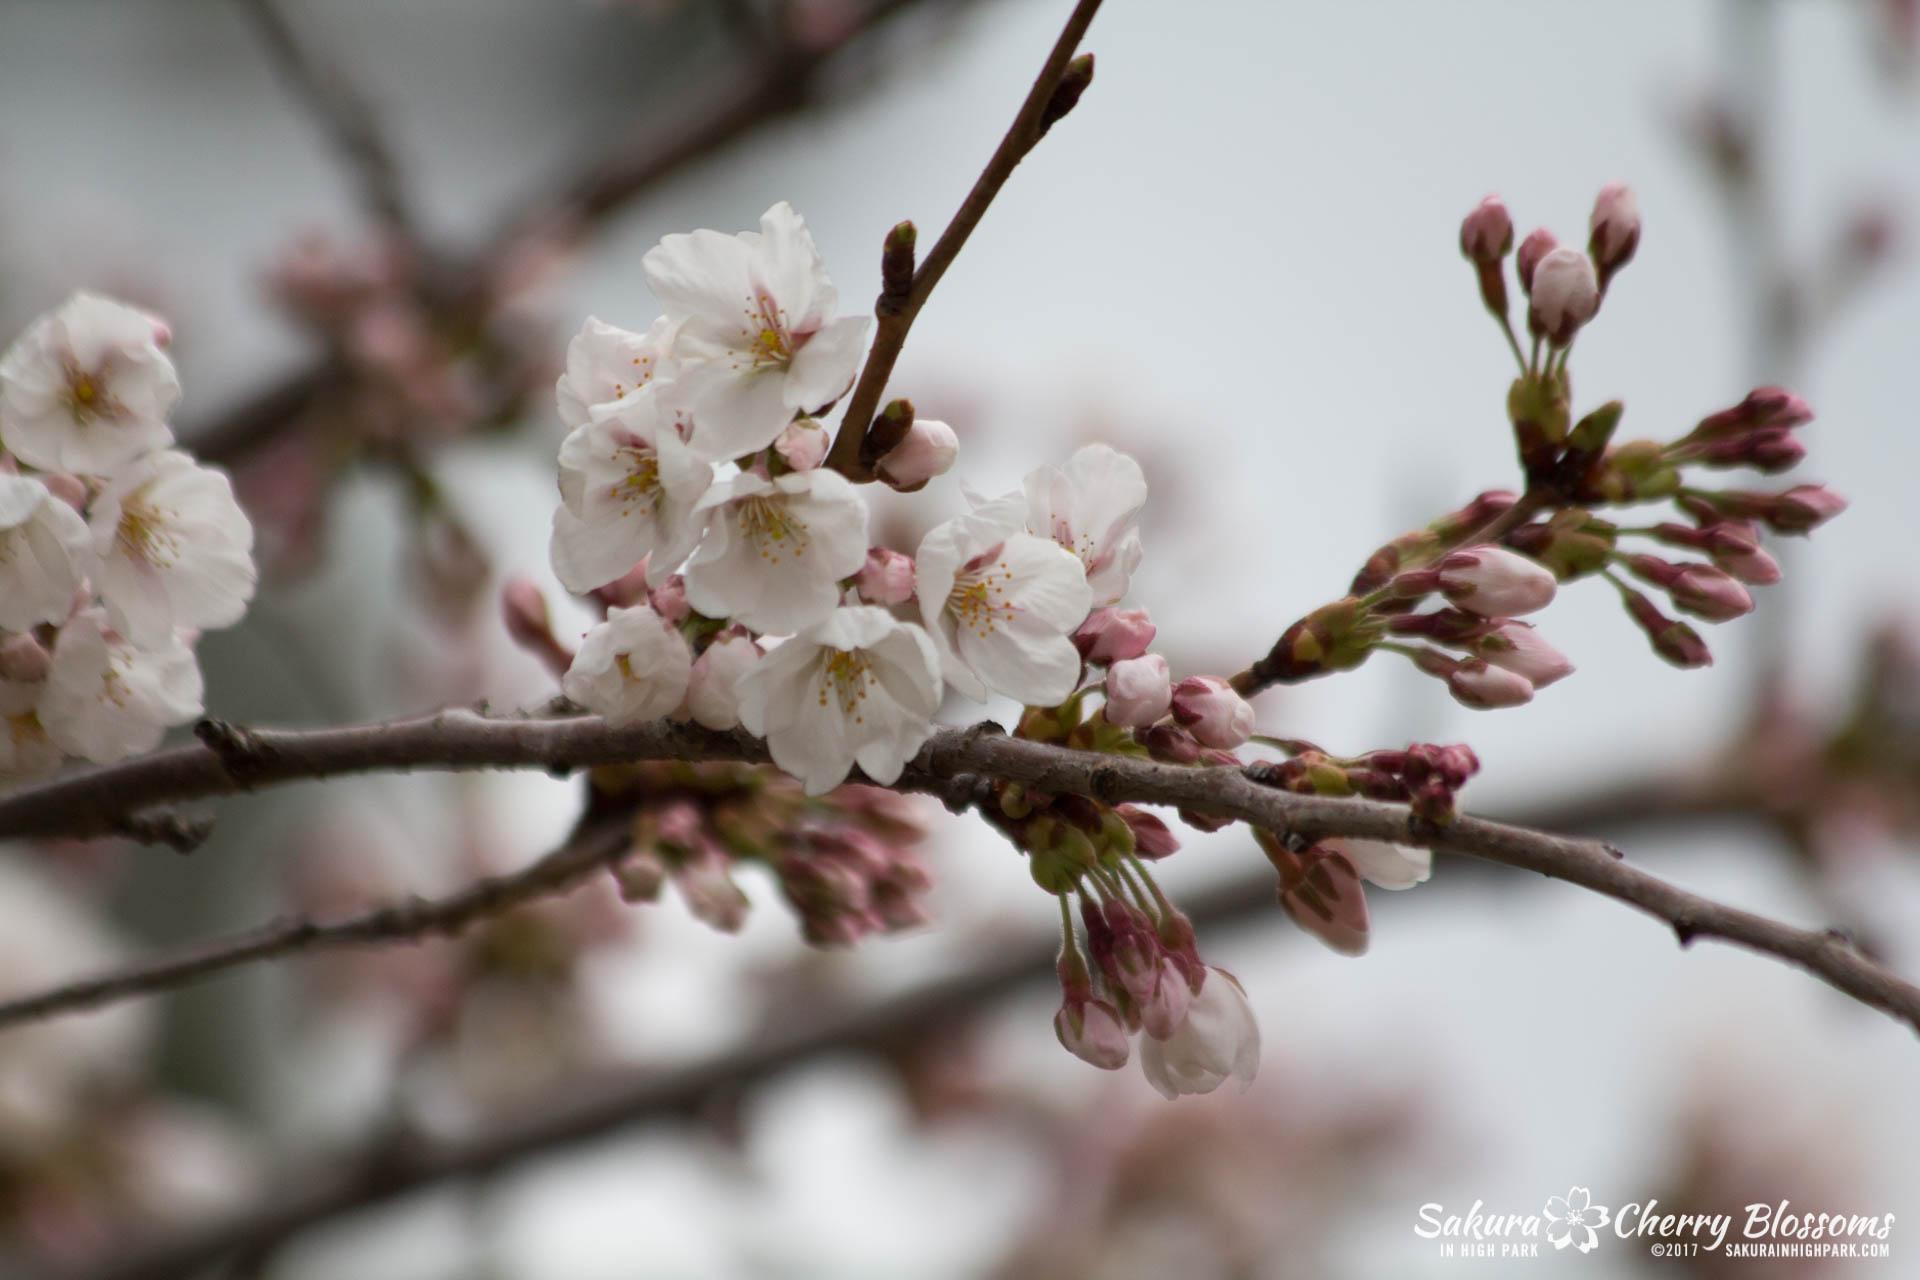 Sakura-Watch-April-21-2017-bloom-still-in-early-stages-26.jpg